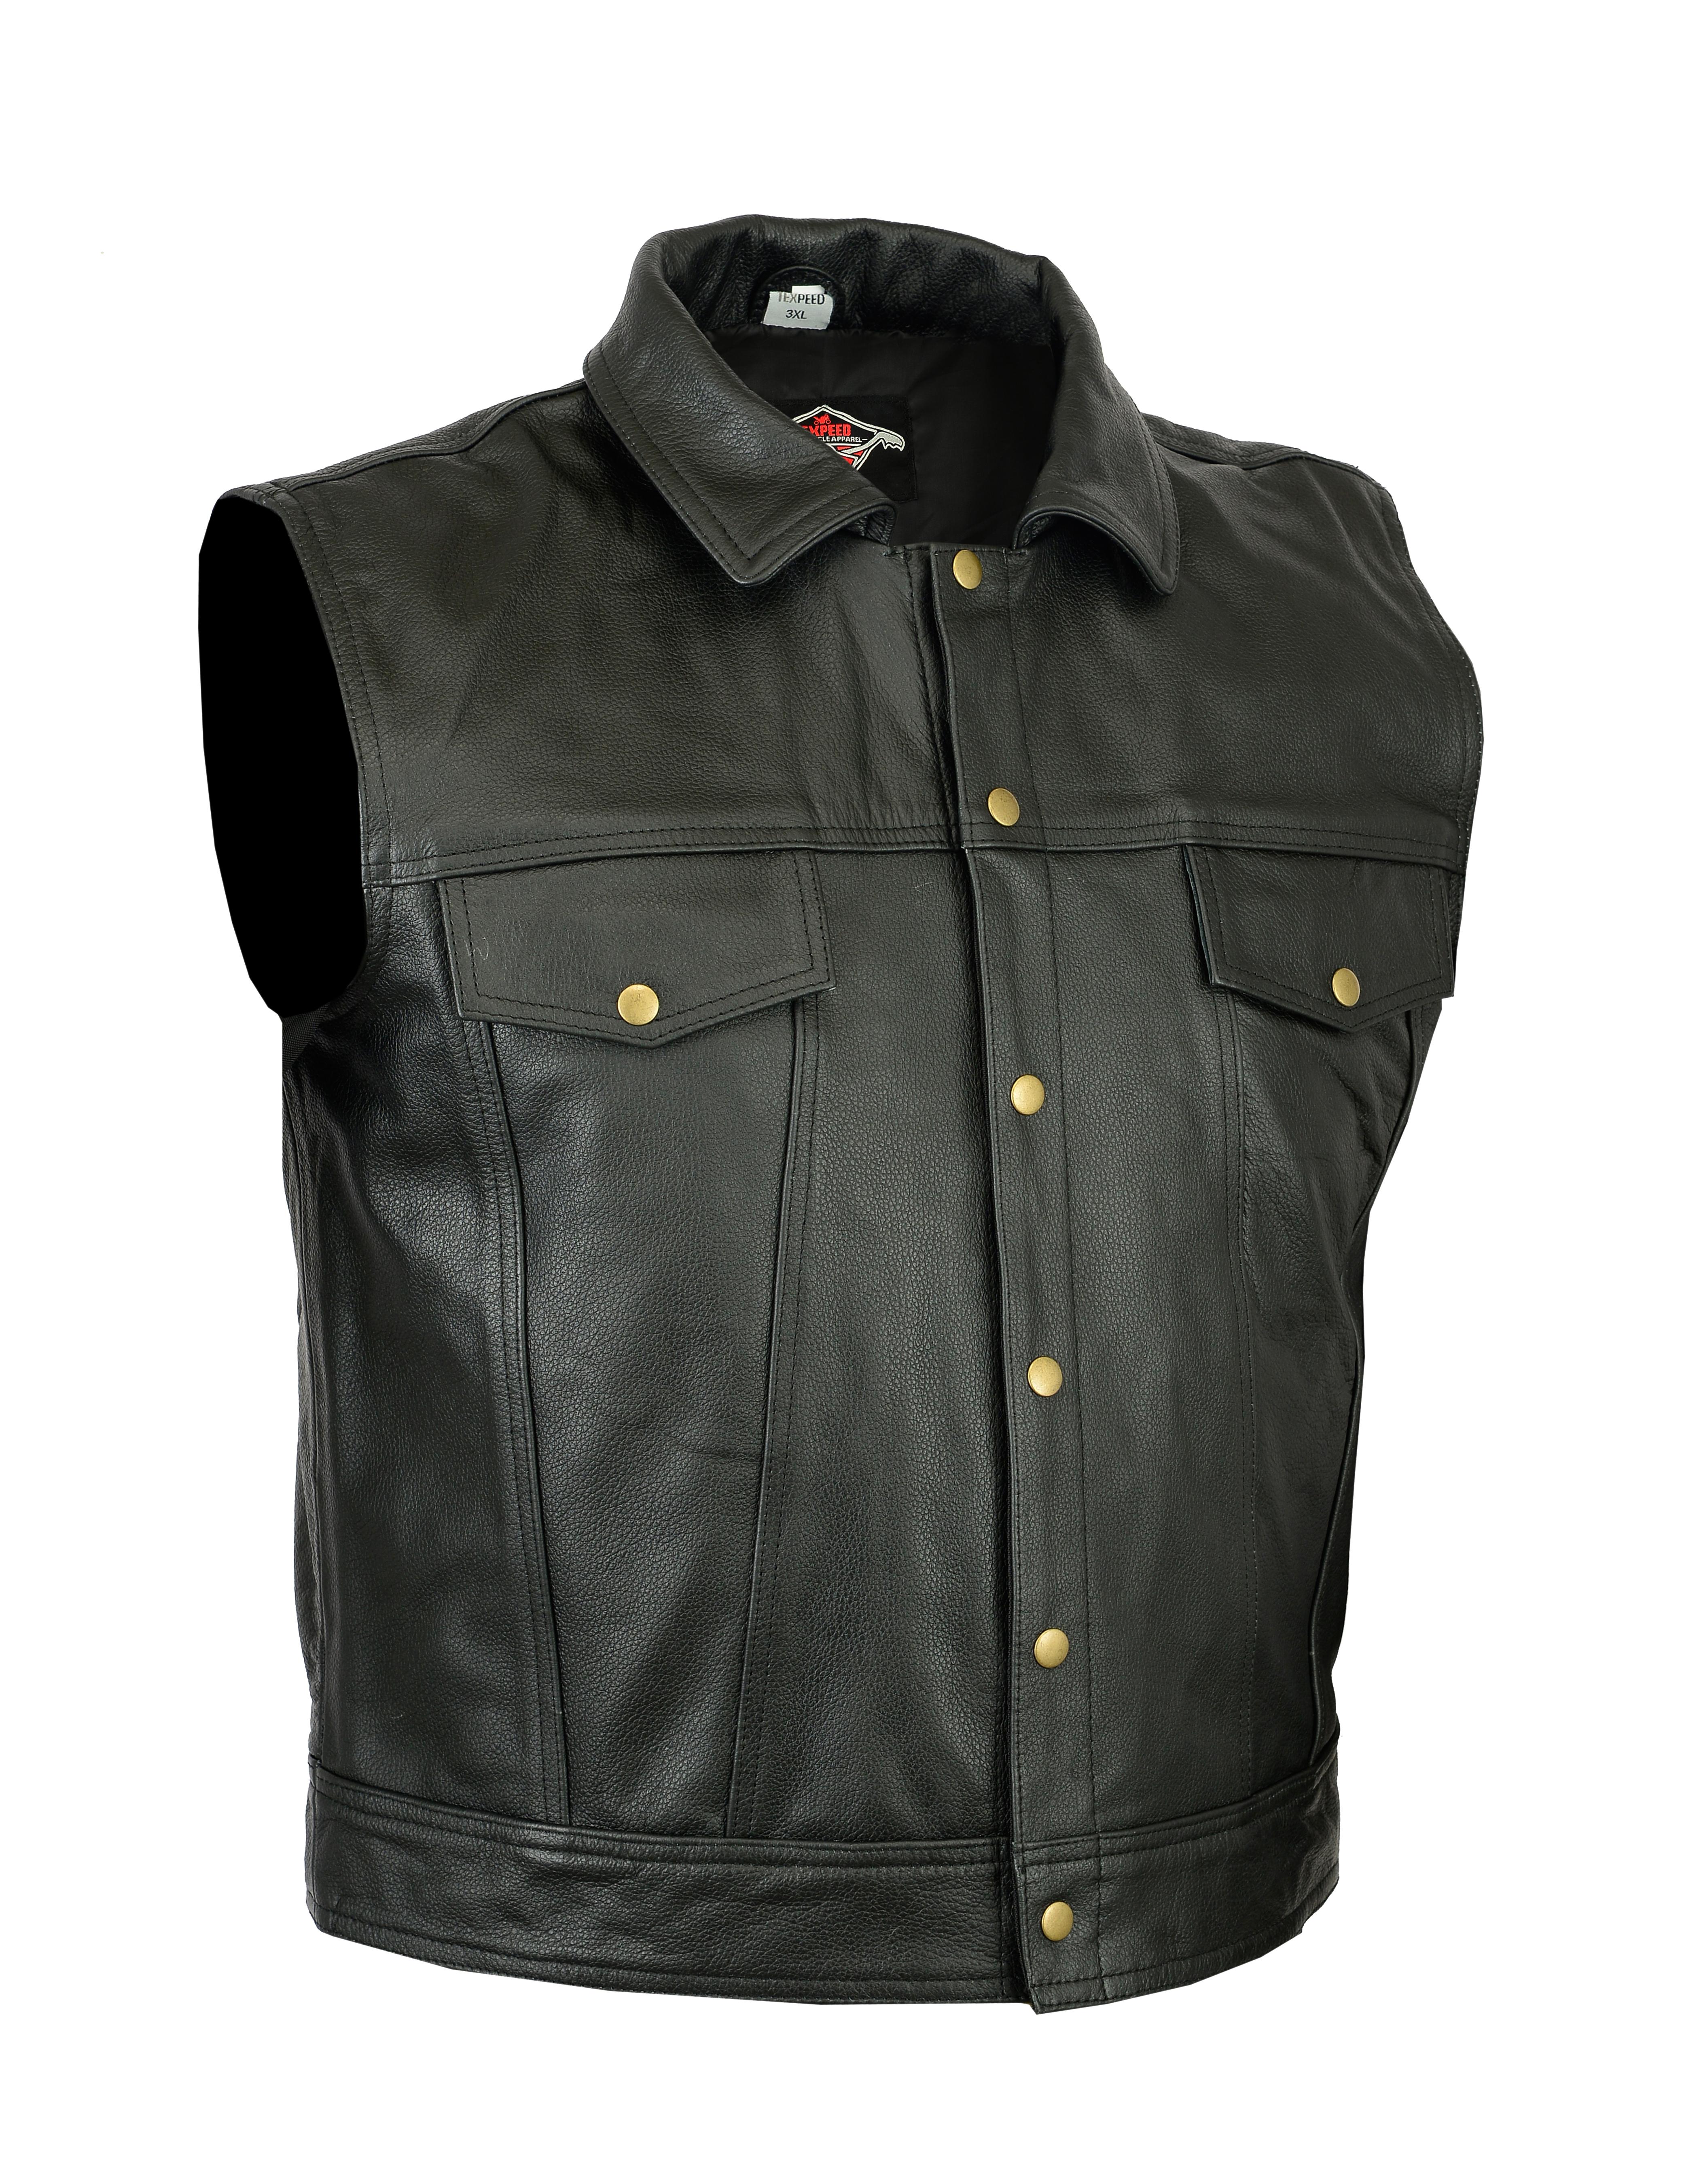 New Mens Wasik Casual Motorbike / Motorcycle Cowhide Leather Waistcoat Vest